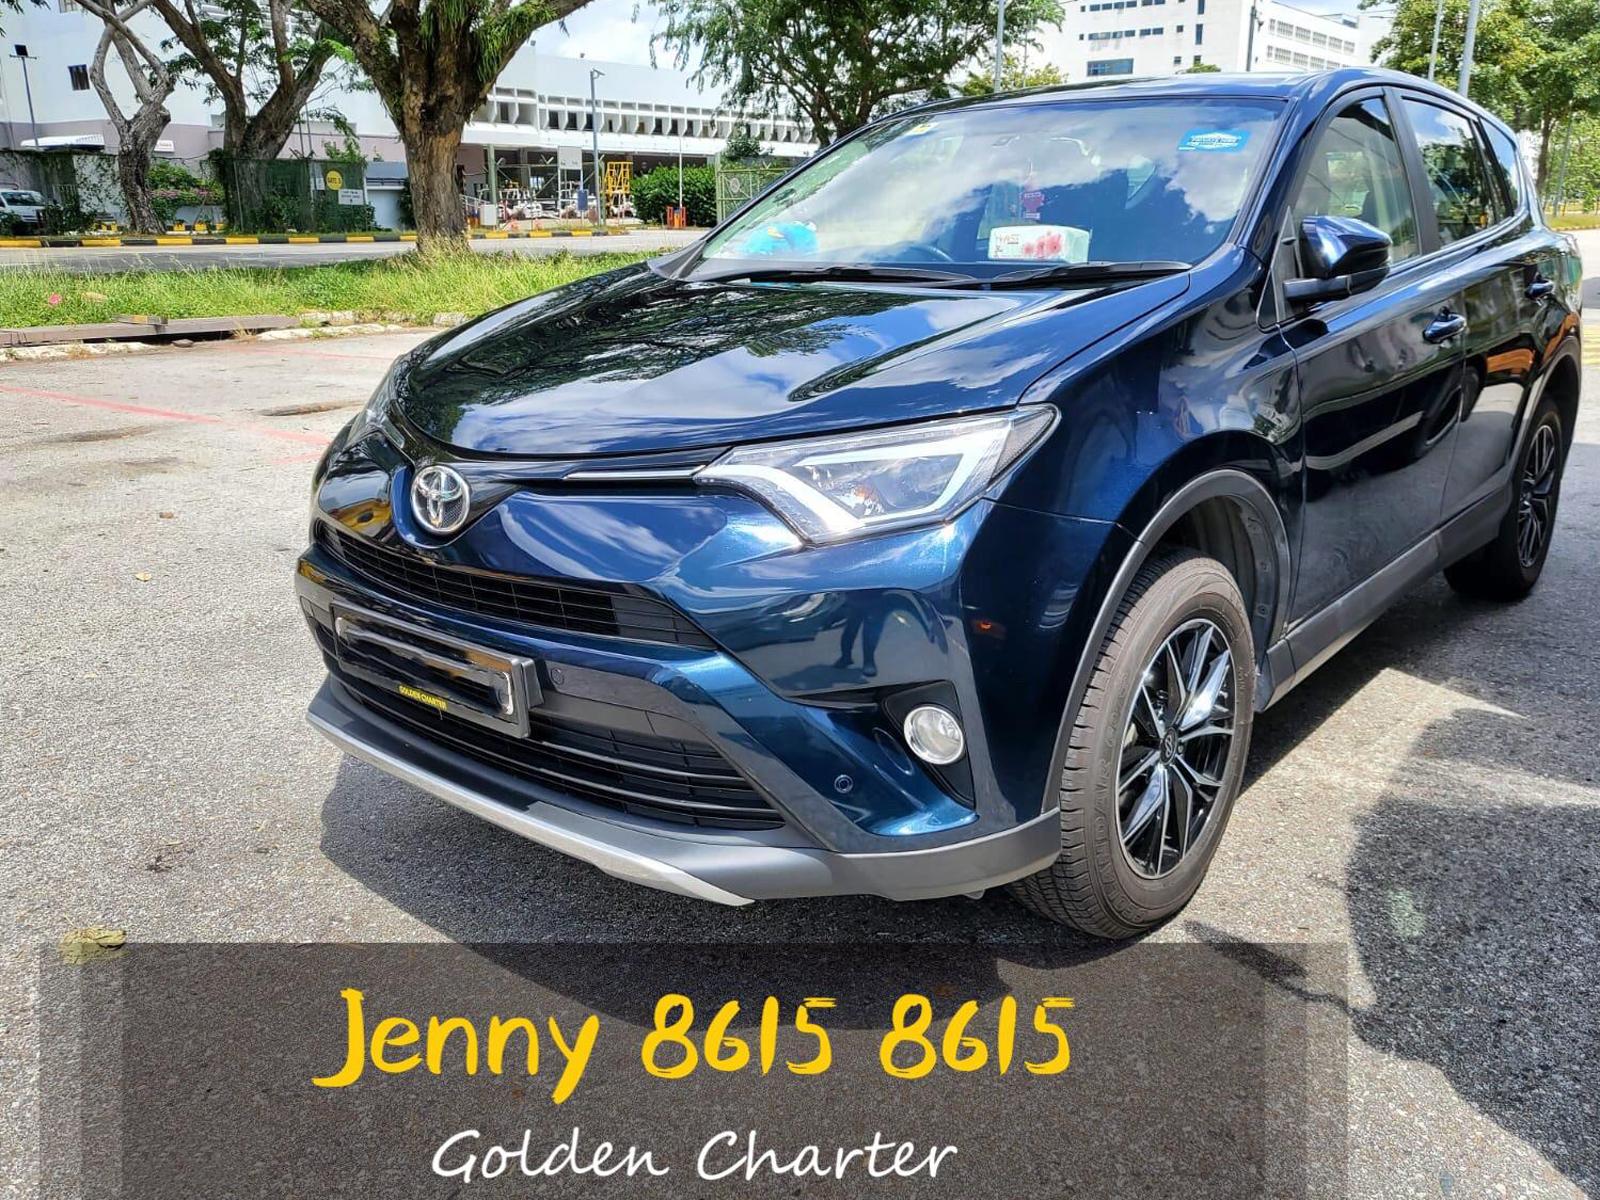 Toyota Rav4 2.0A (PHV Private Hire Rental)